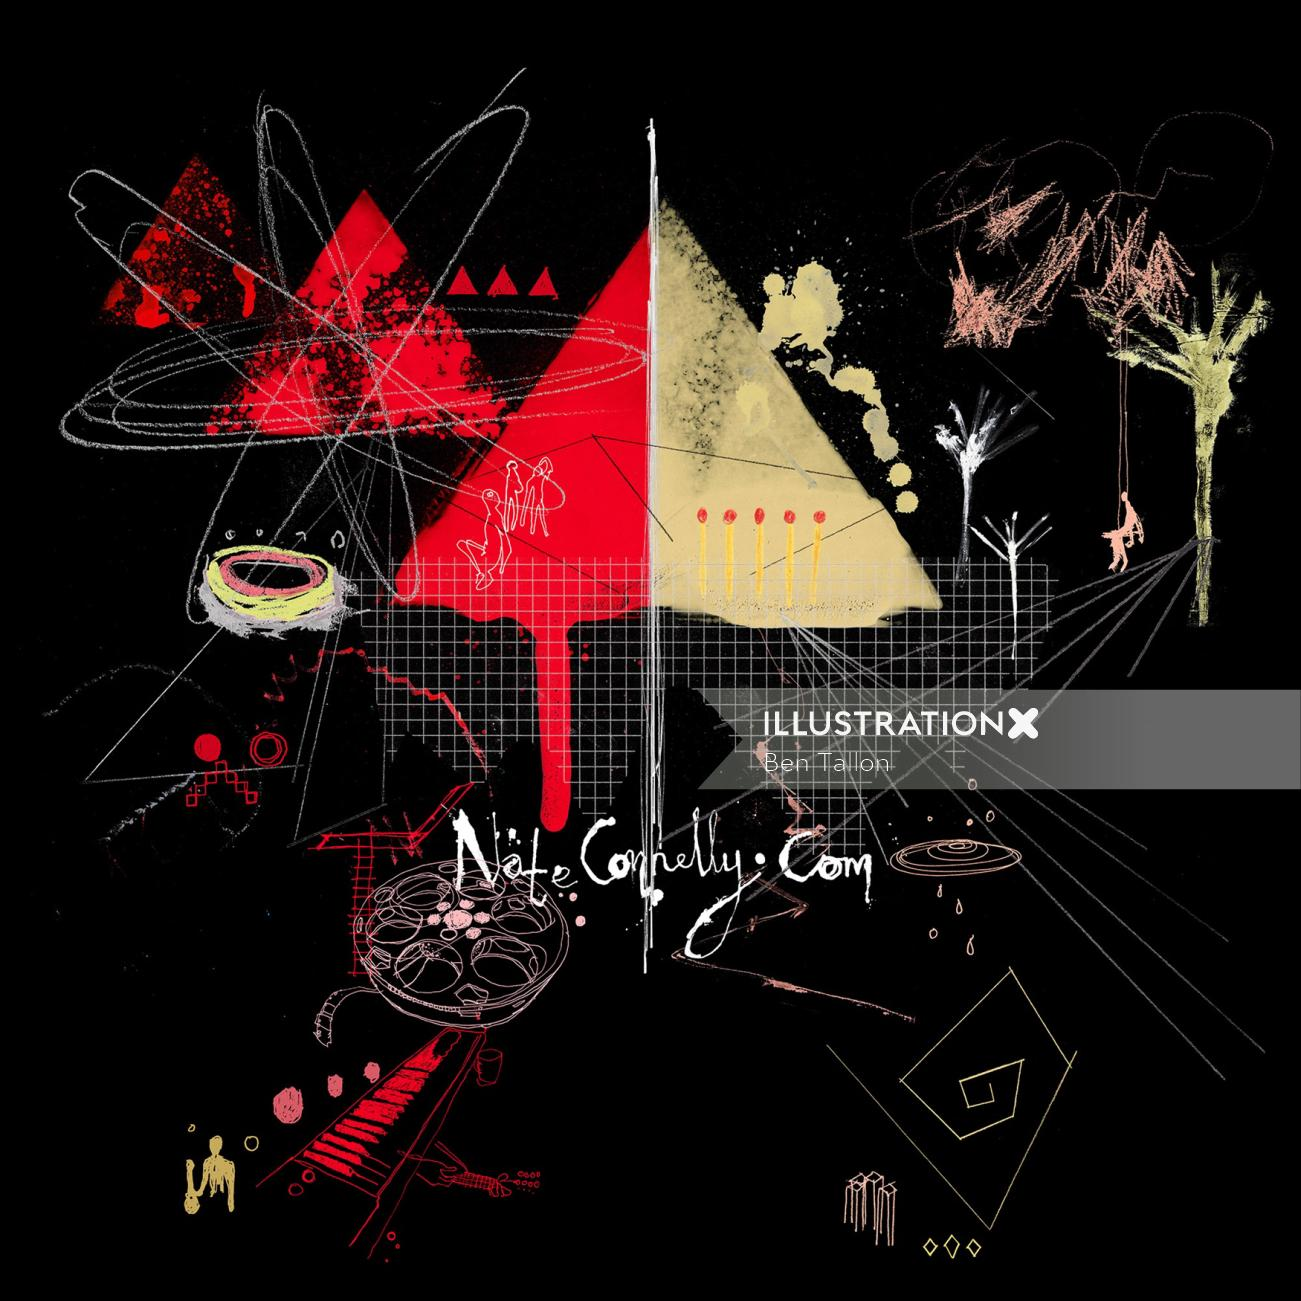 Nate Connelly music composer graphic design